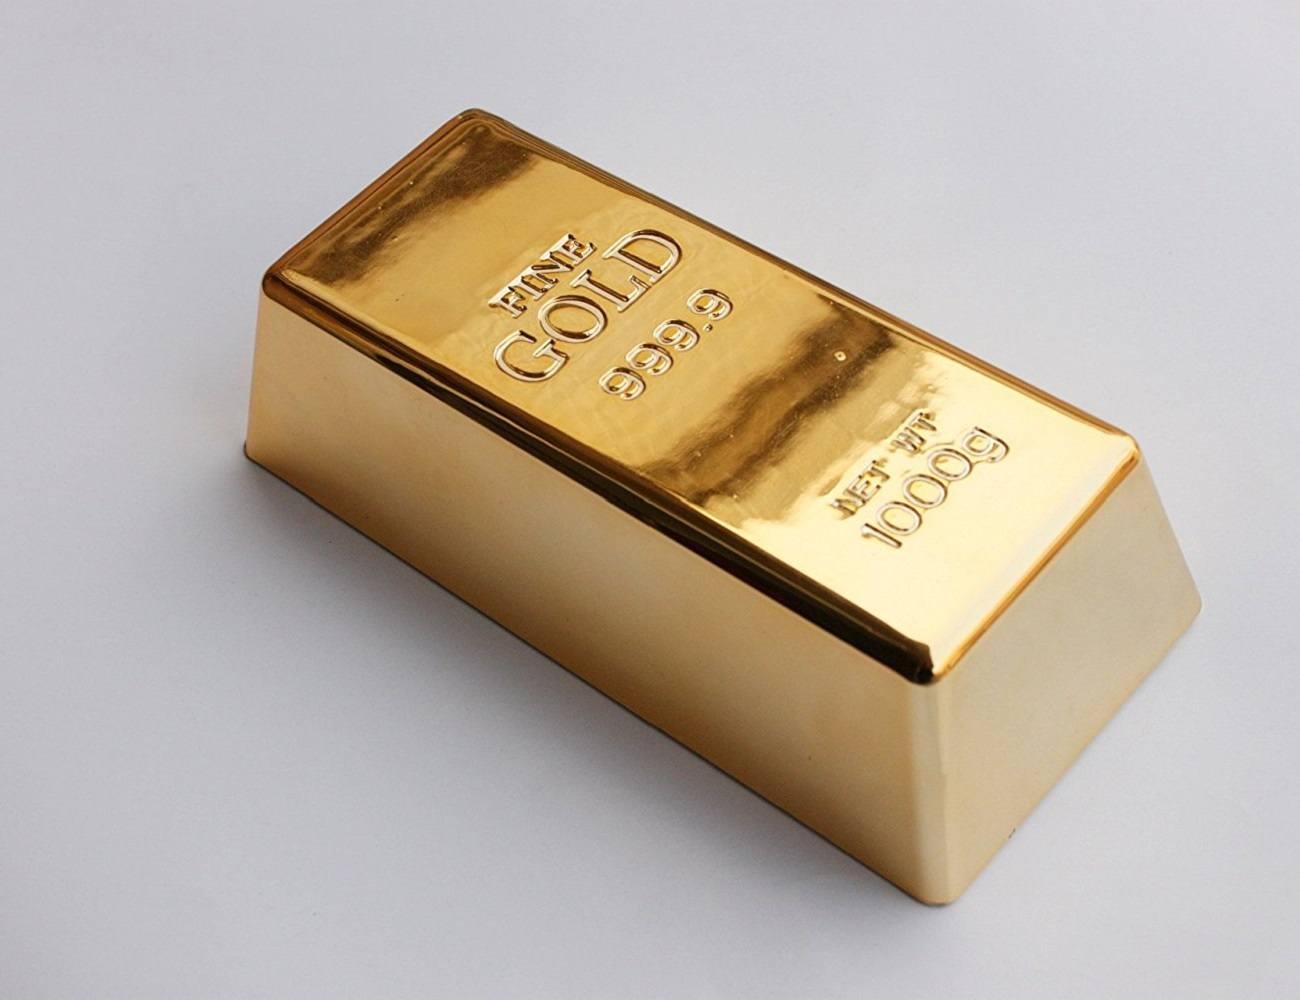 Gold Bullion Doorstop; Gold Bullion Doorstop & Gold Bullion Doorstop » Gadget Flow